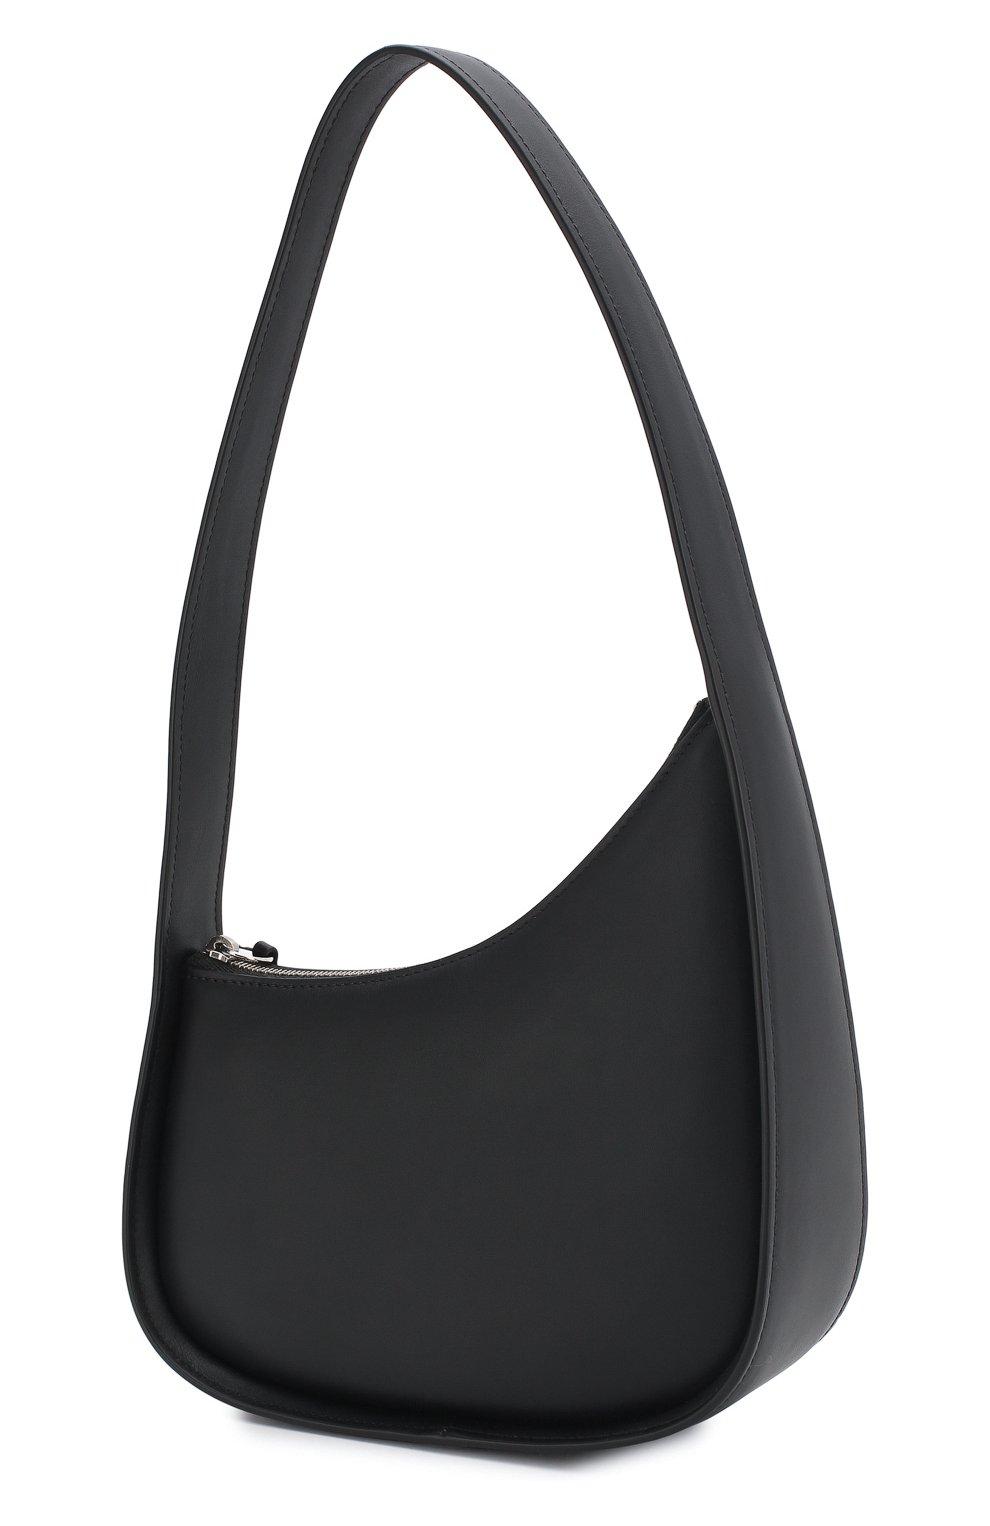 Женская сумка half moon THE ROW черного цвета, арт. W1249L52   Фото 3 (Сумки-технические: Сумки top-handle; Материал: Натуральная кожа; Размер: mini)